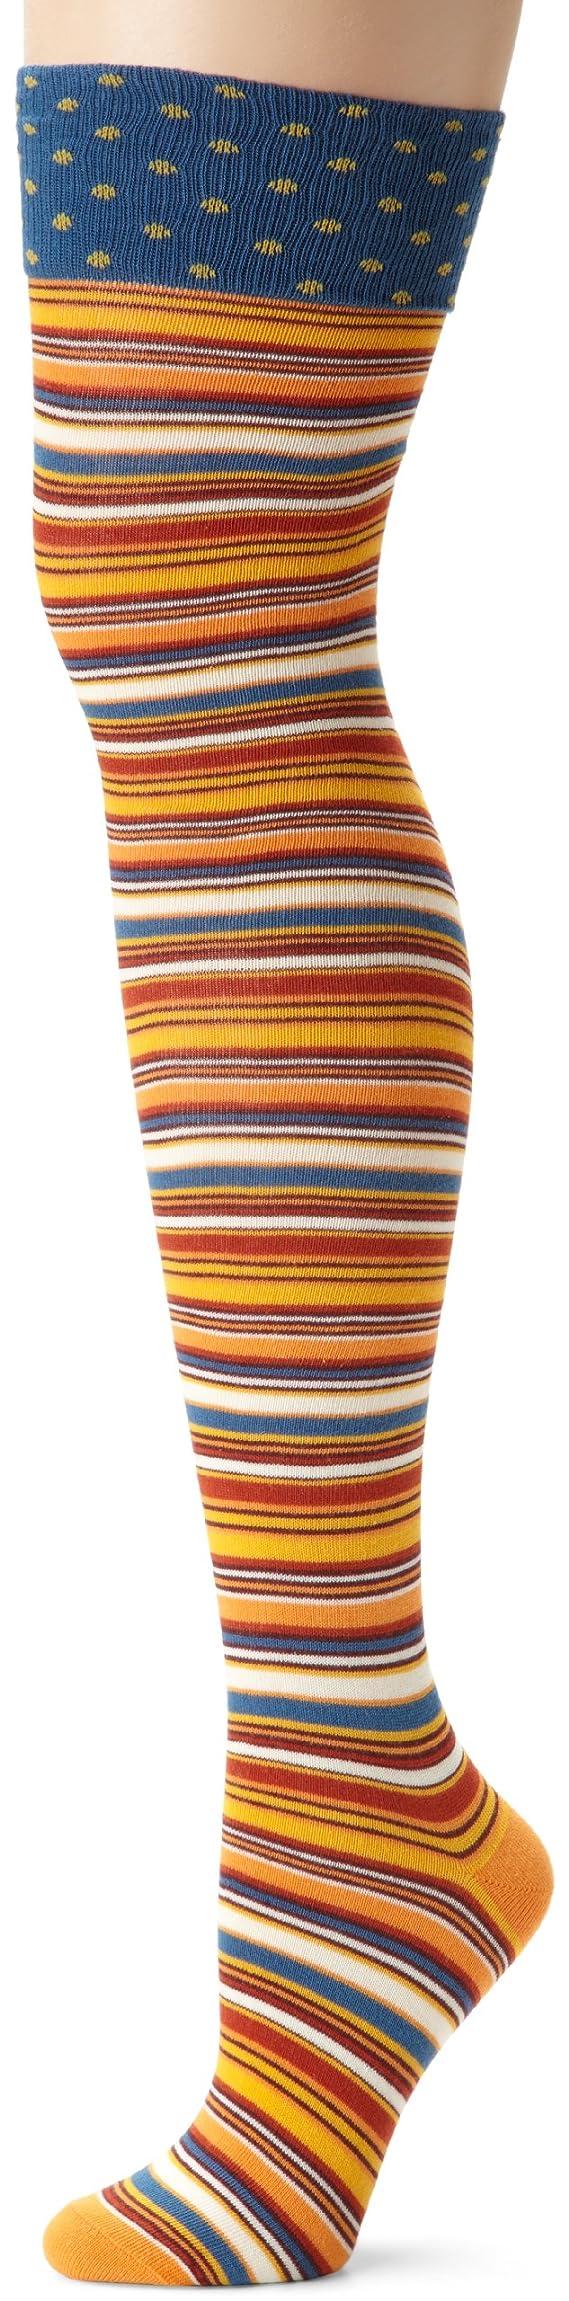 Ozone Women's Striped Layers